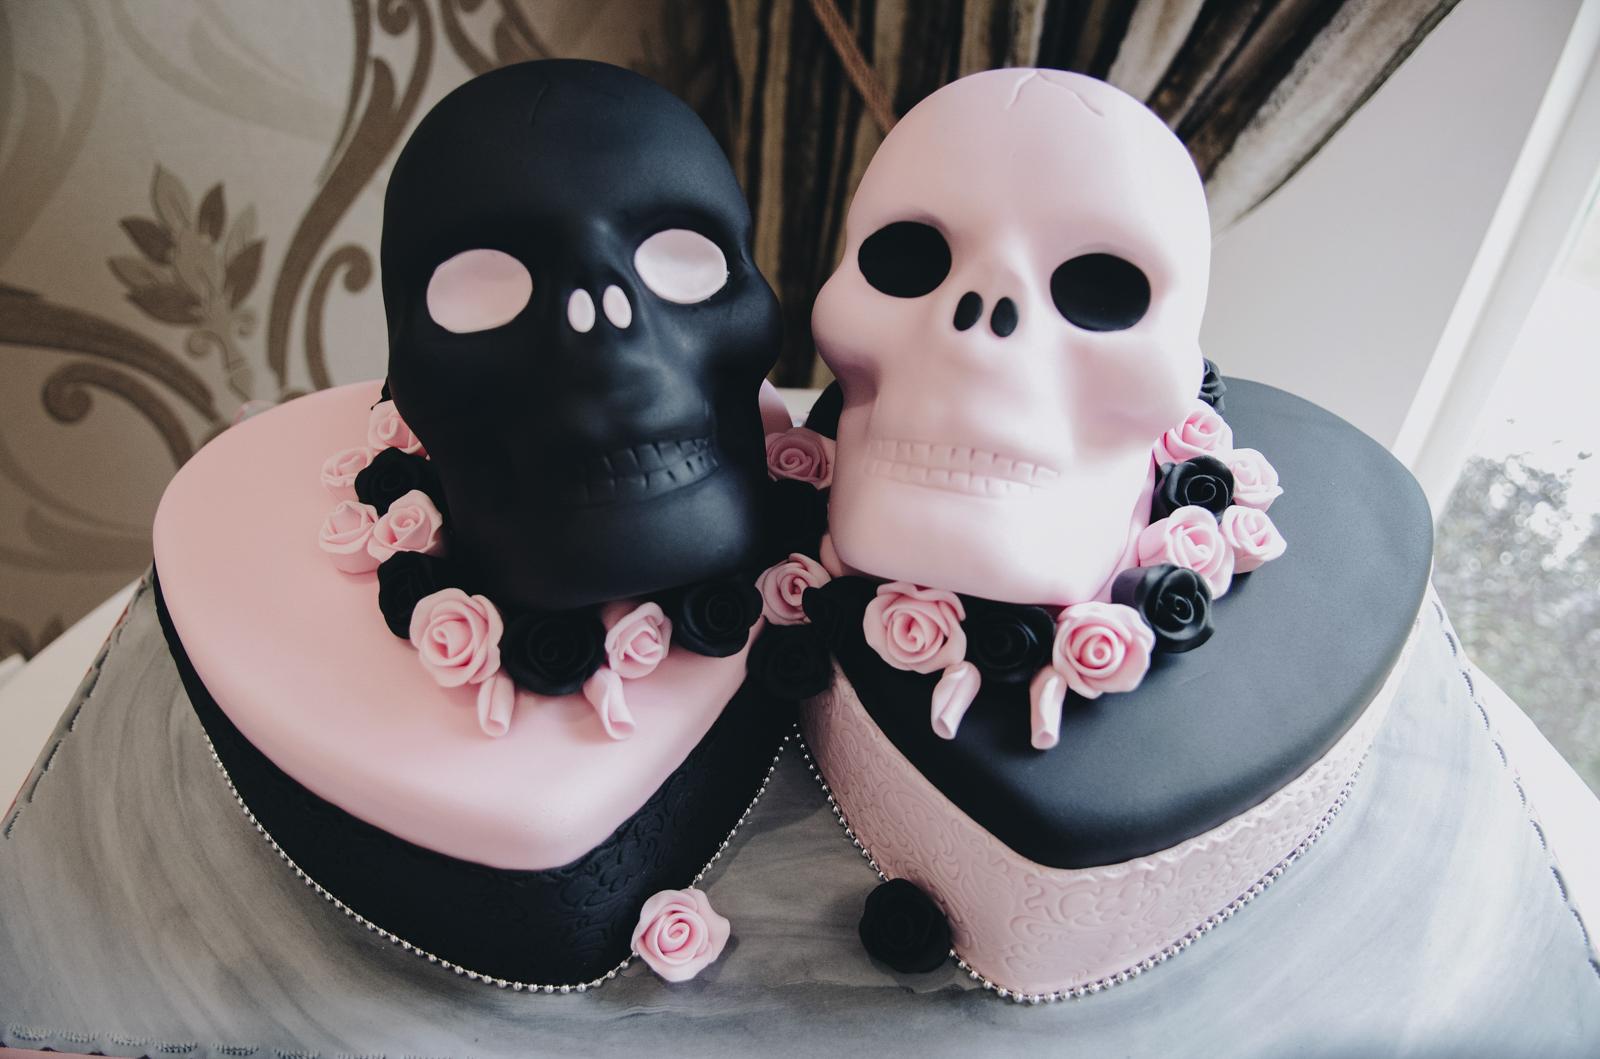 Alternative-North-West-Manchester-Wedding-Photography-Astley-bank-Wedding-skull-cake-tattooed-groom-35.jpg